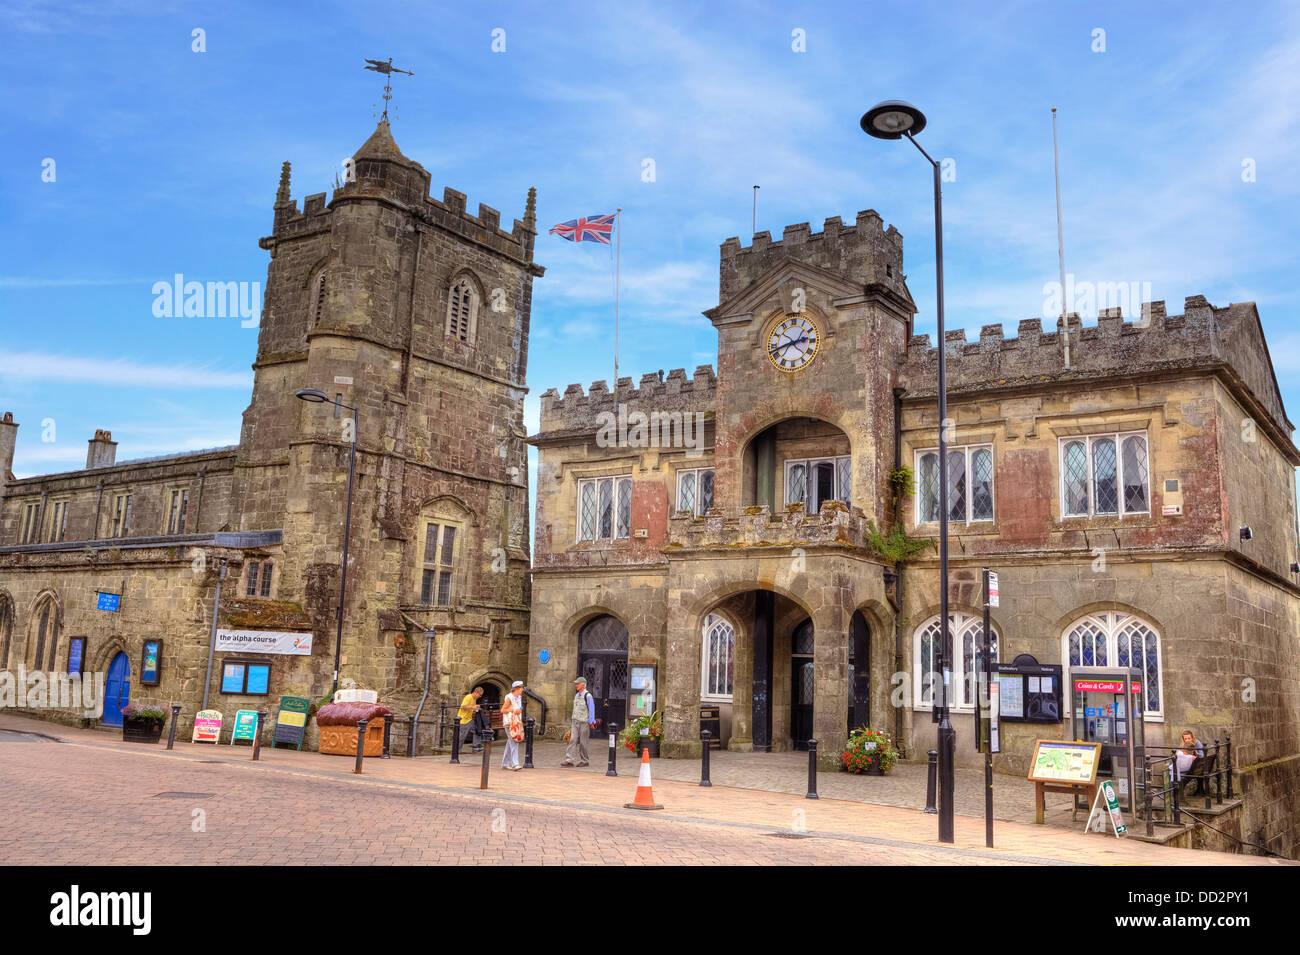 Shaftesbury, St Peter's Church, Dorset, England, United Kingdom - Stock Image